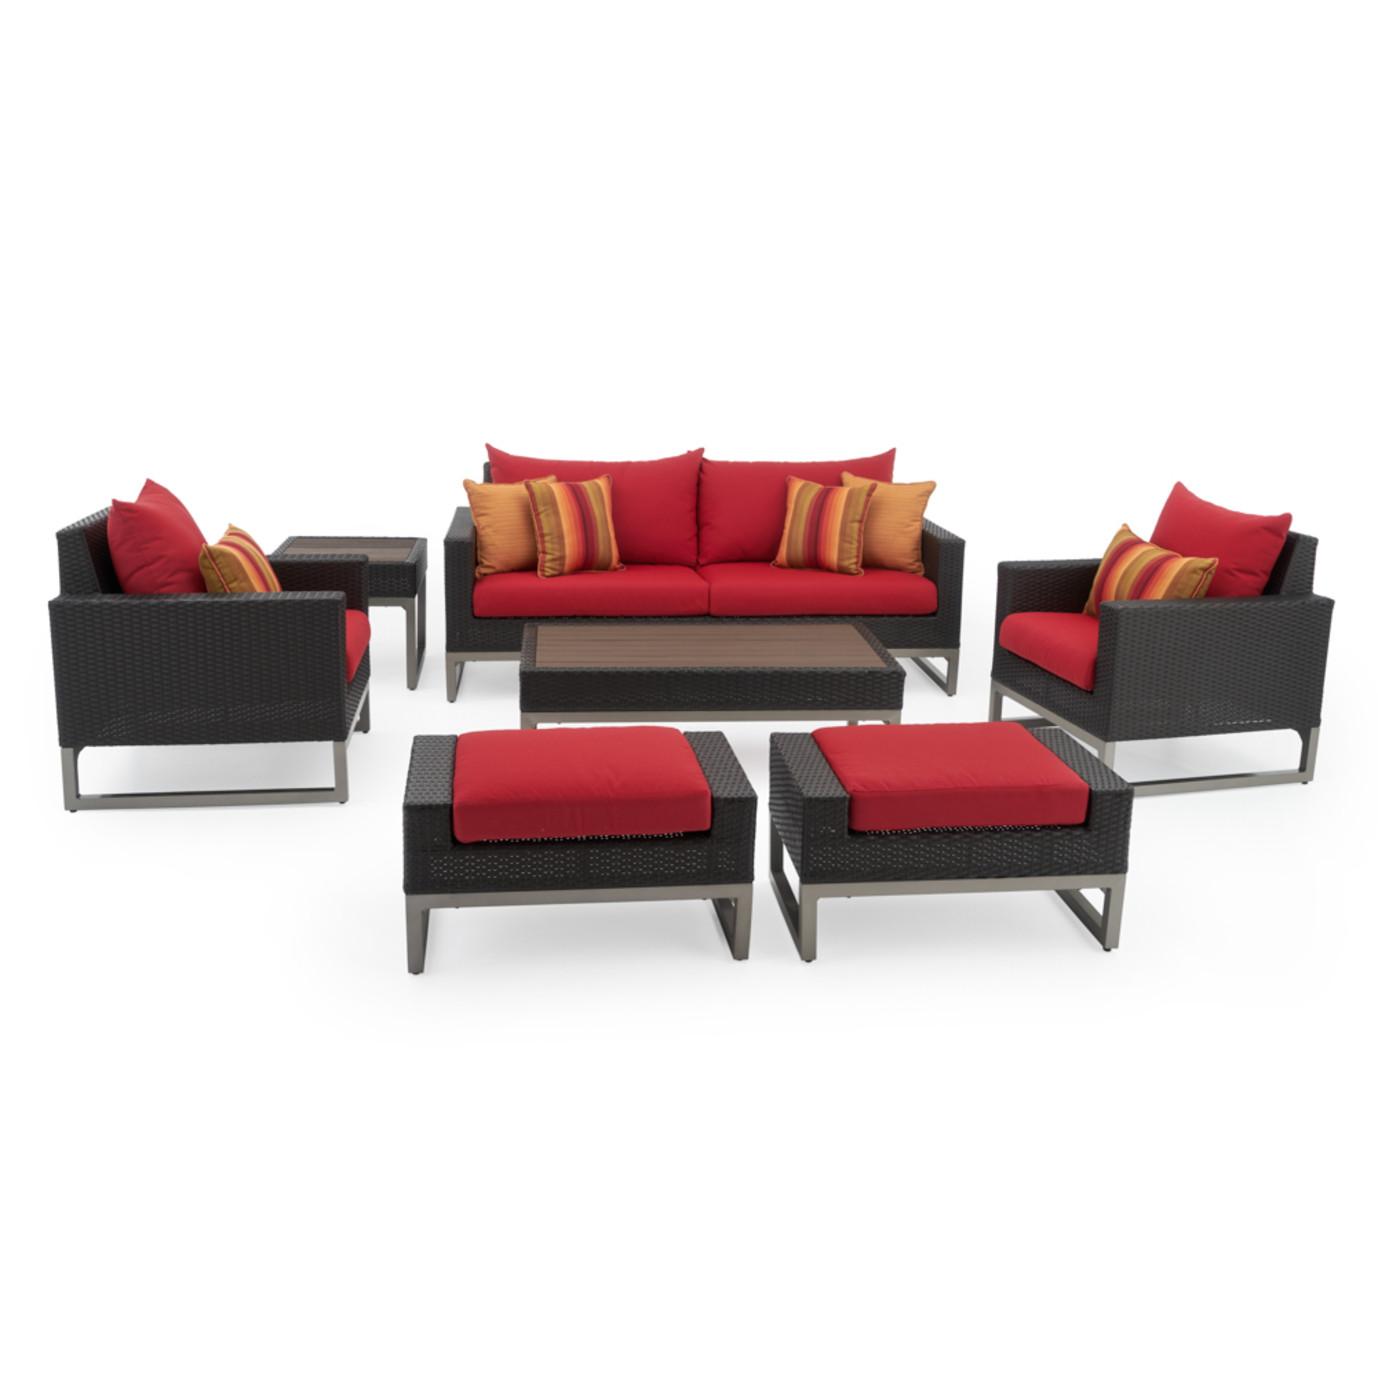 Milo™ Espresso 7pc Deep Seating Set -Sunset Red